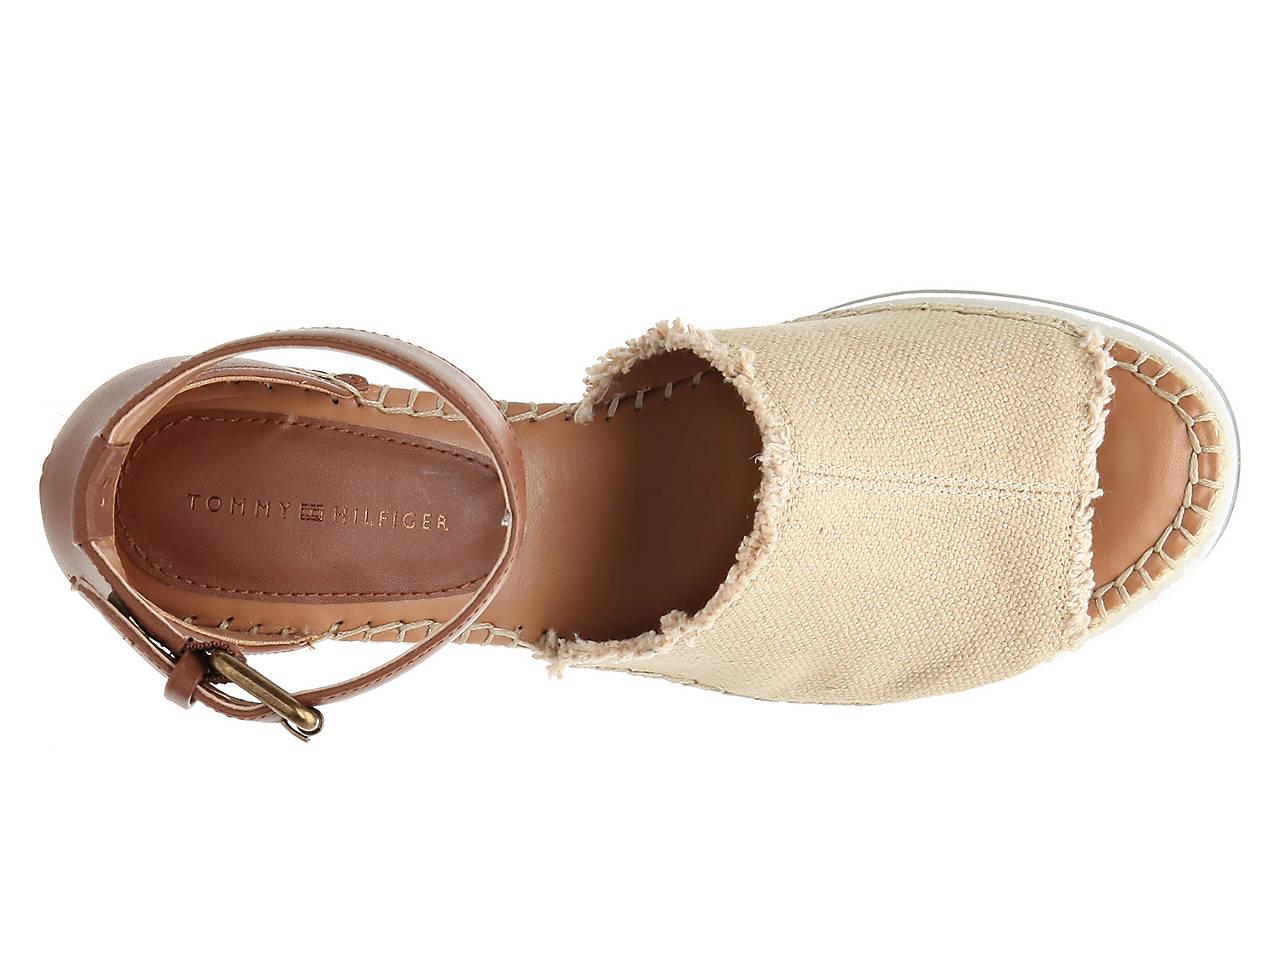 70c8b0032290 Tommy Hilfiger Yavino Espadrille Wedge Sandal Women s Shoes